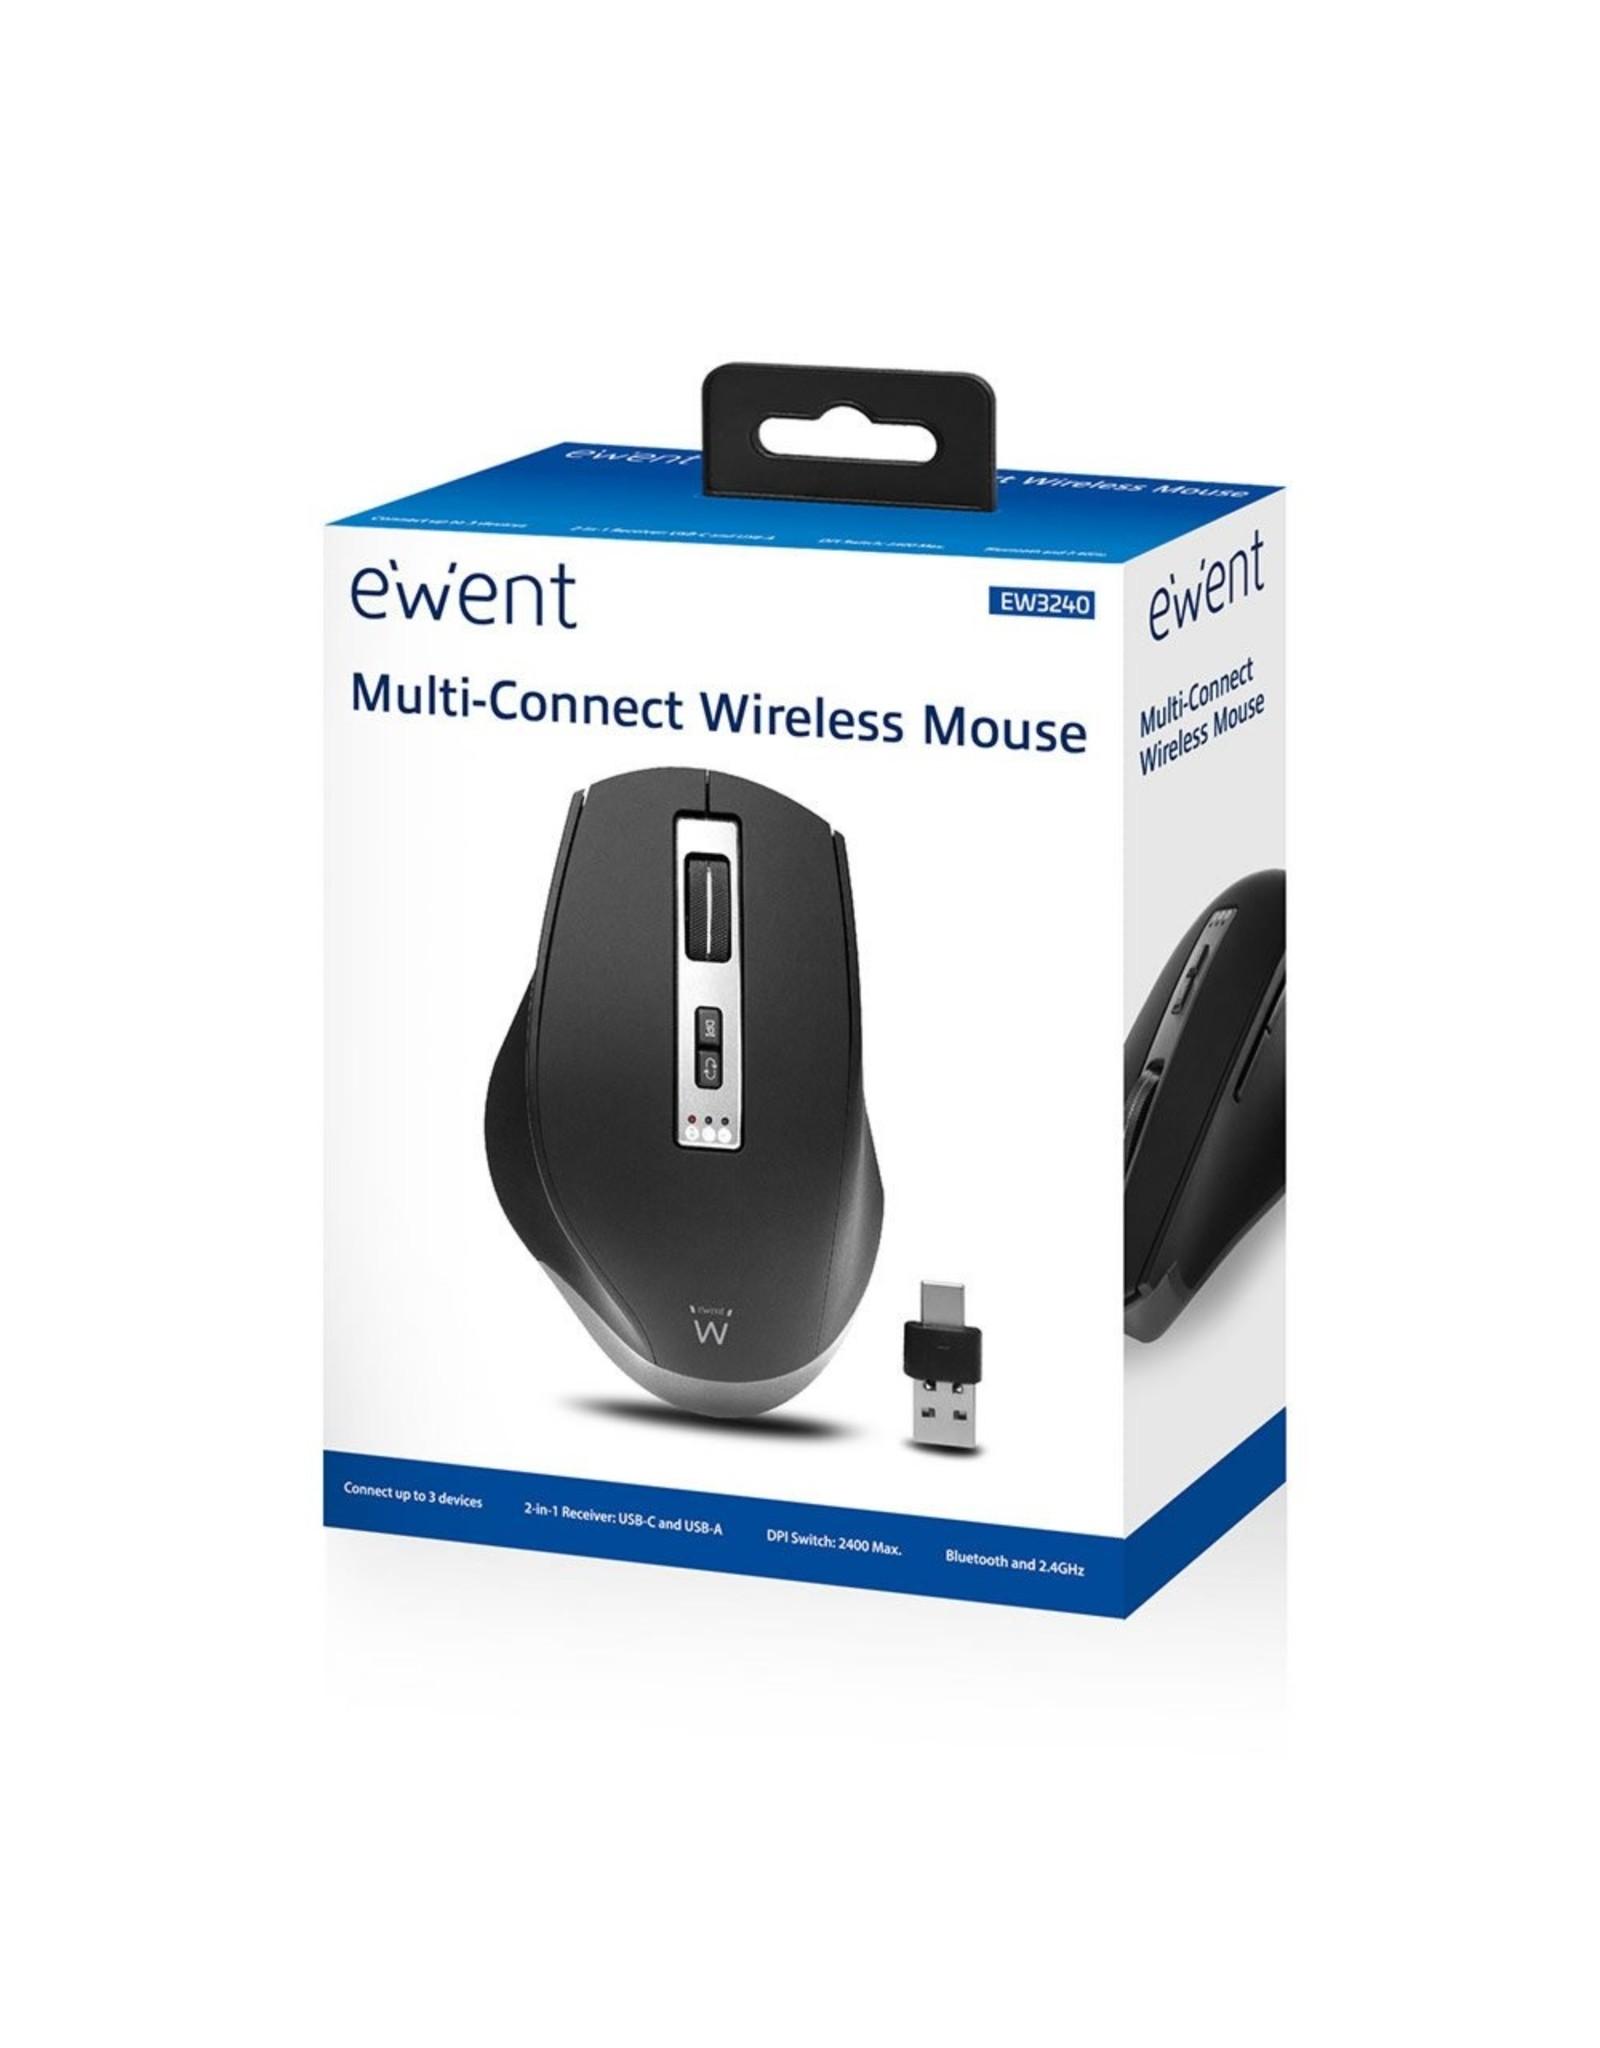 Ewent Draadloze multi-connect muis, 600 tot 2400 dpi, zwa